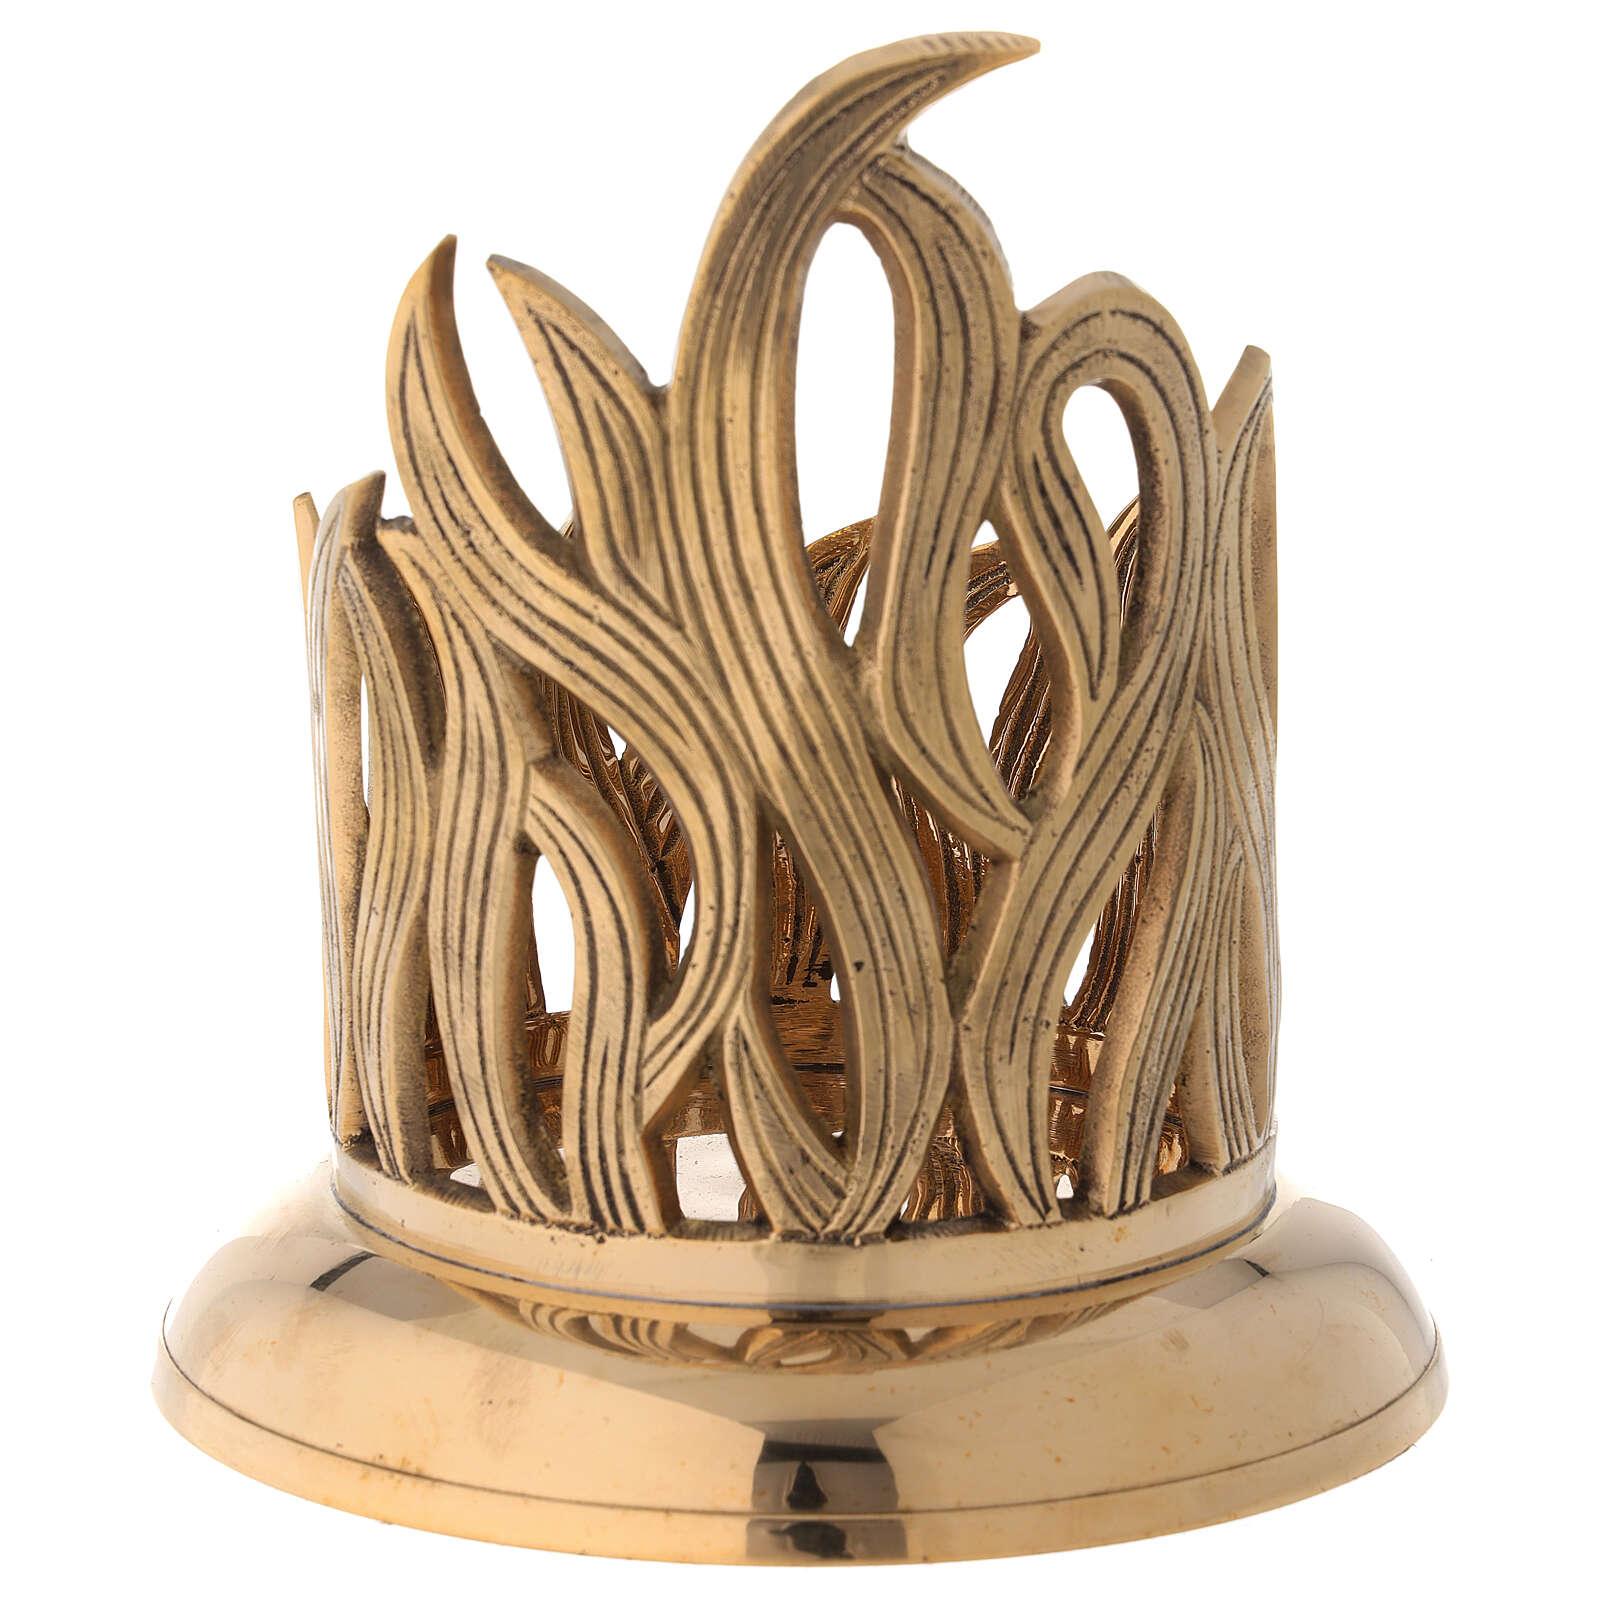 Portavela latón dorado forma llamas incisas diámetro 10 cm 4